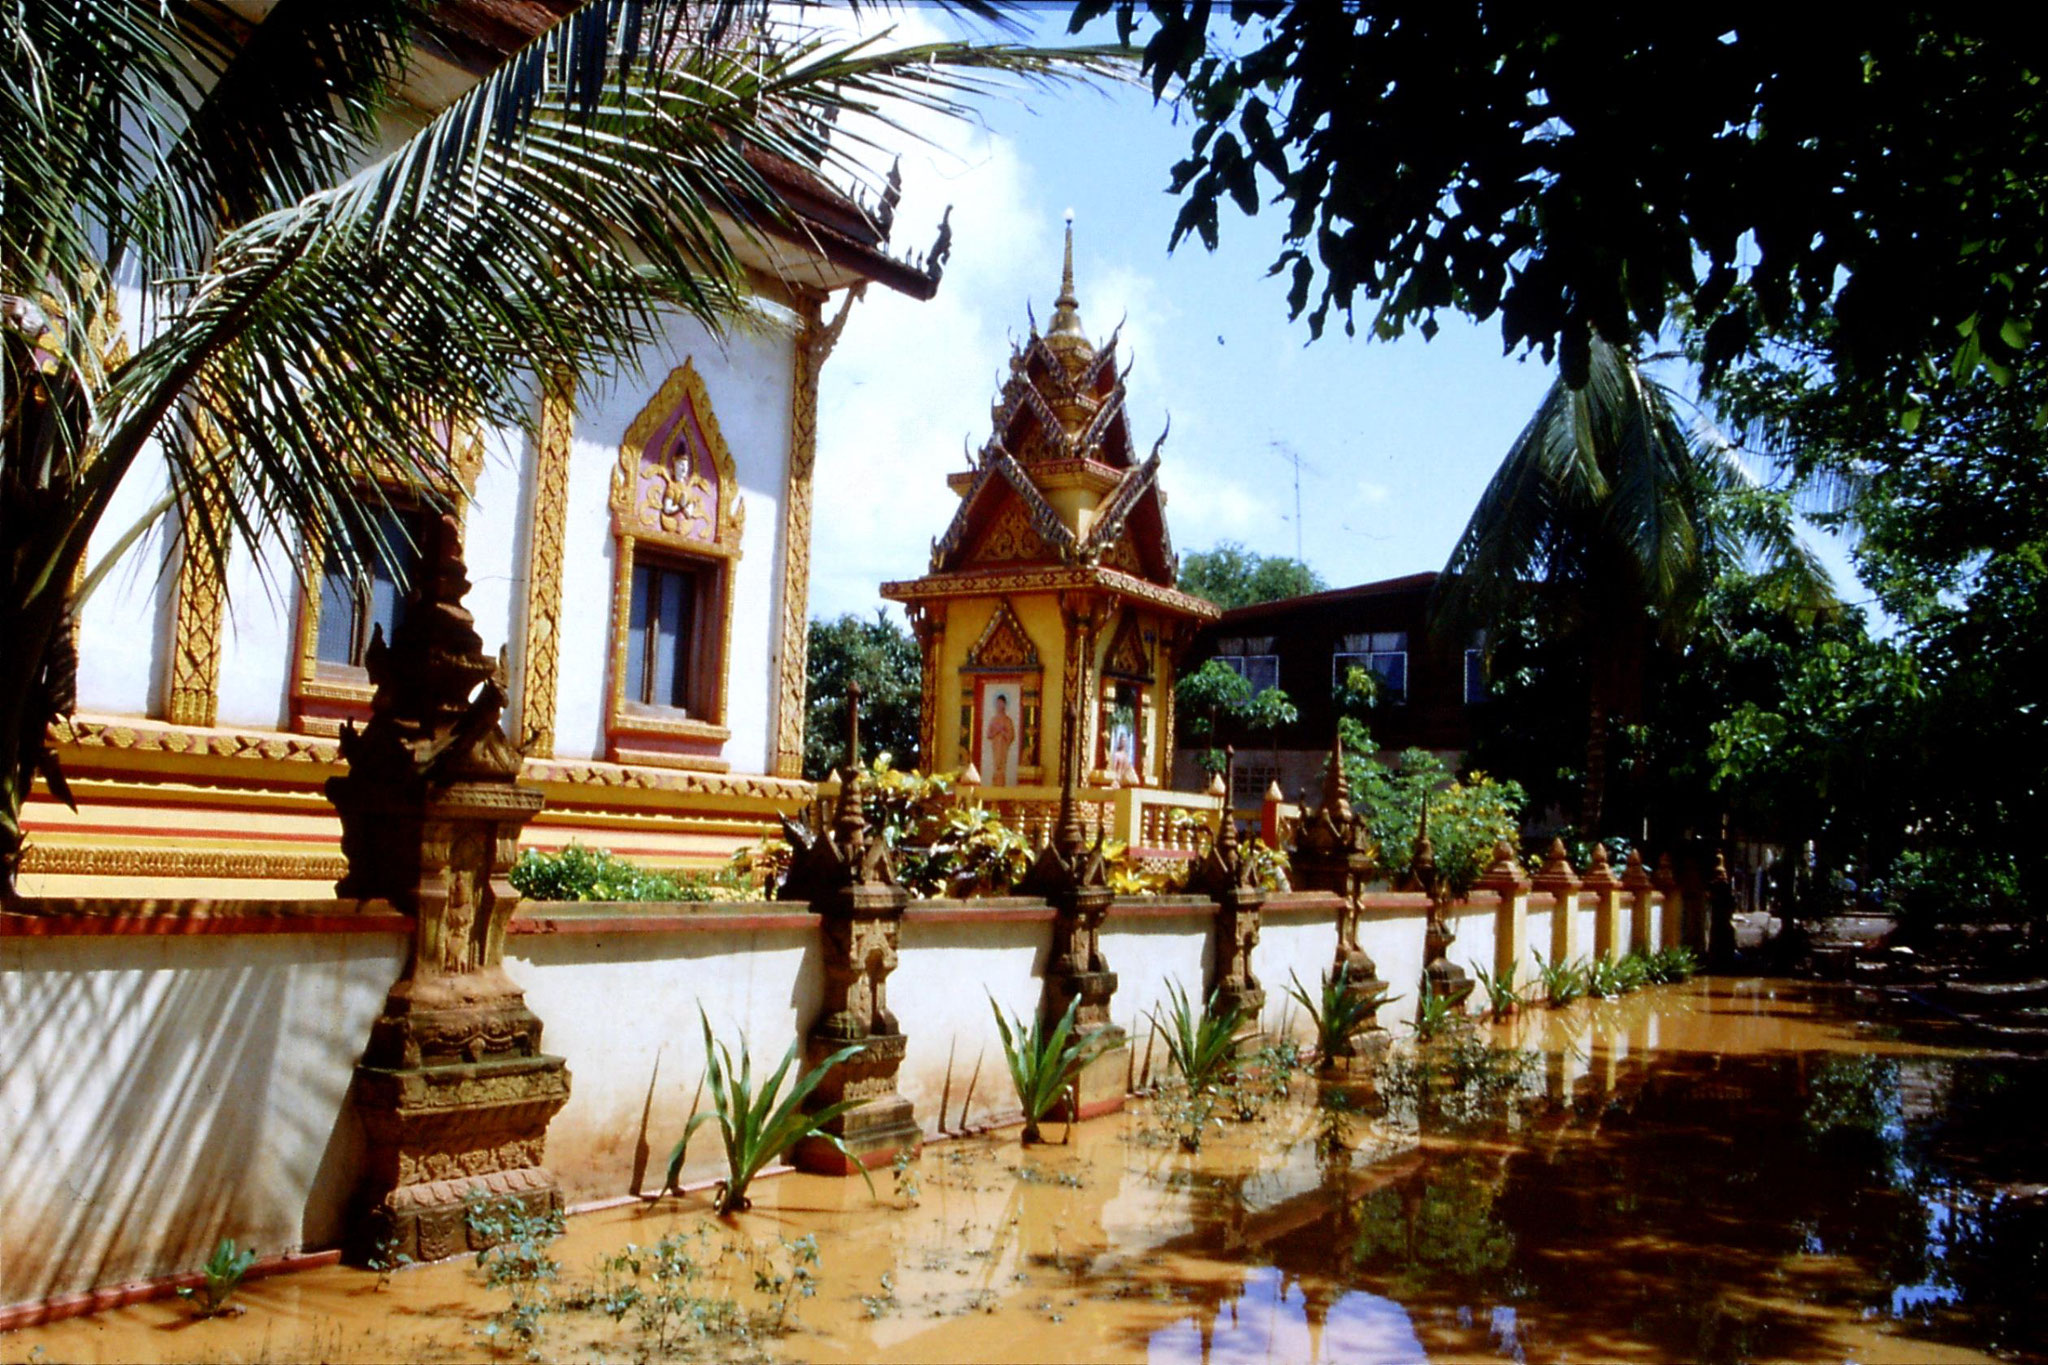 30/5/1990: 22: village east of Nong Khai